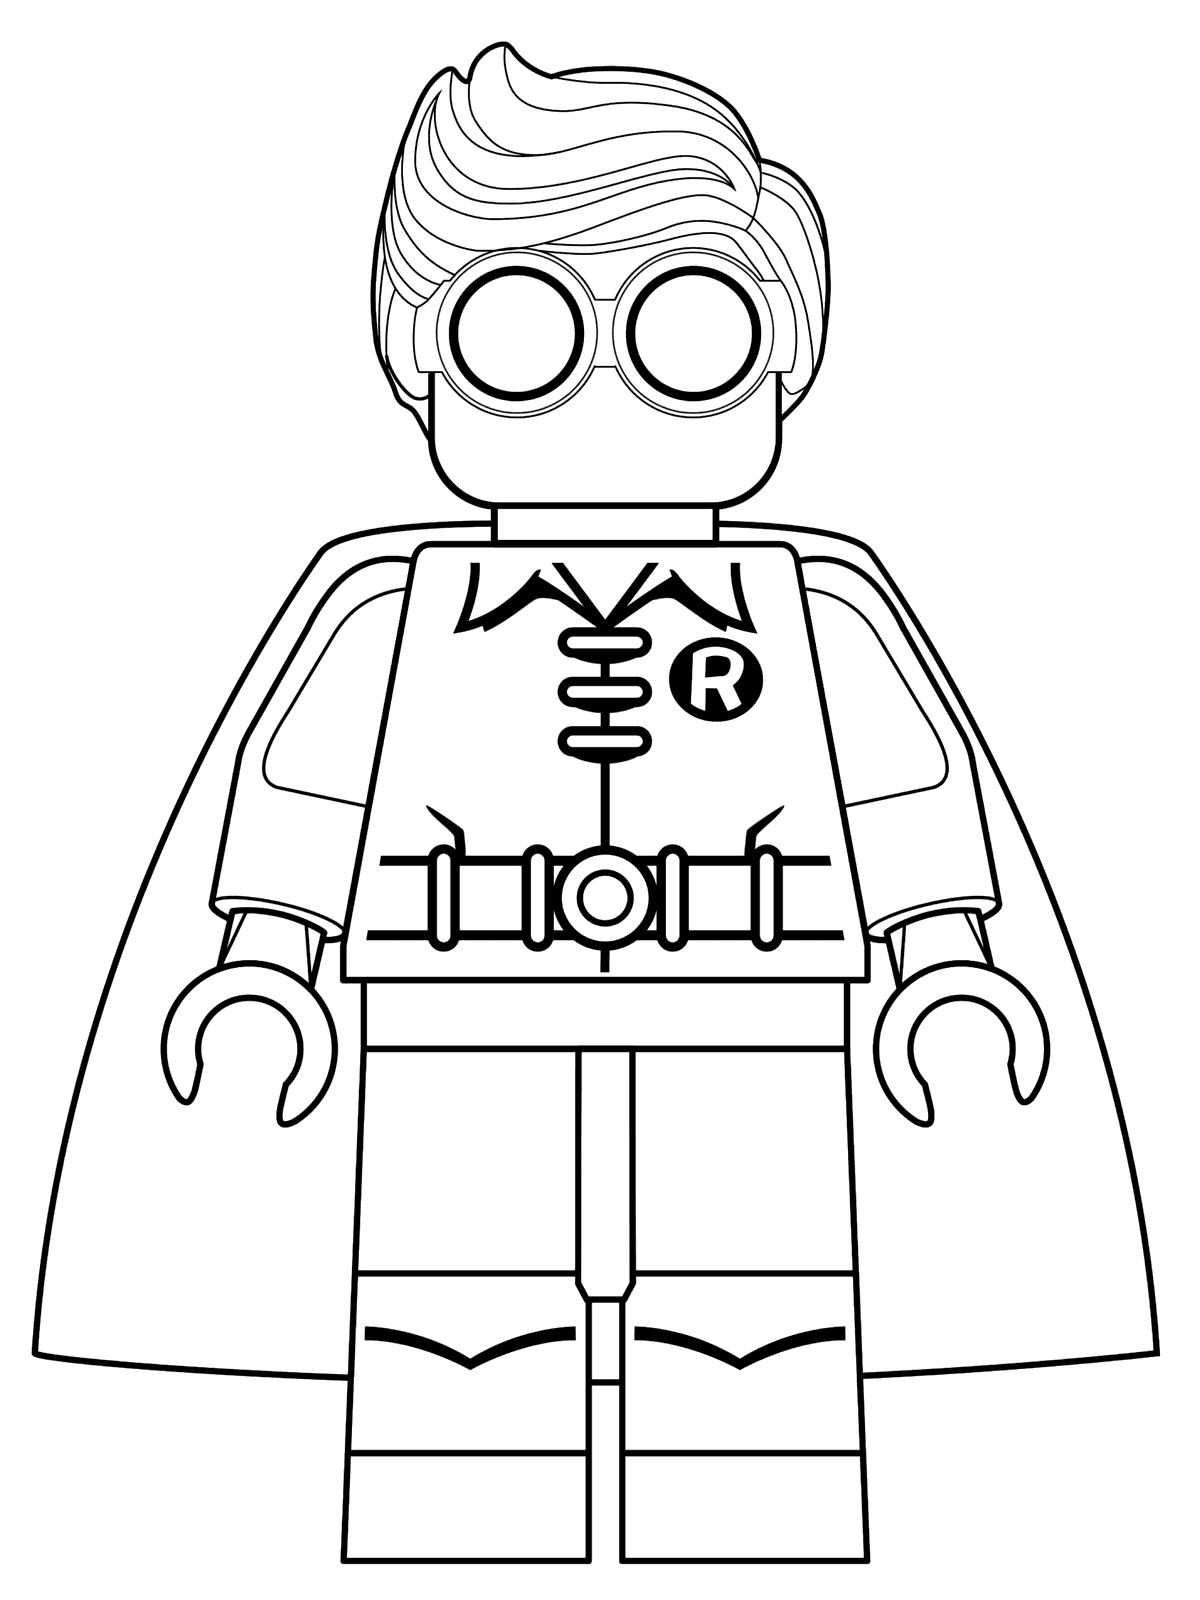 16 Coloring Pages Of Lego Batman Movie Lego Batman Superhelden